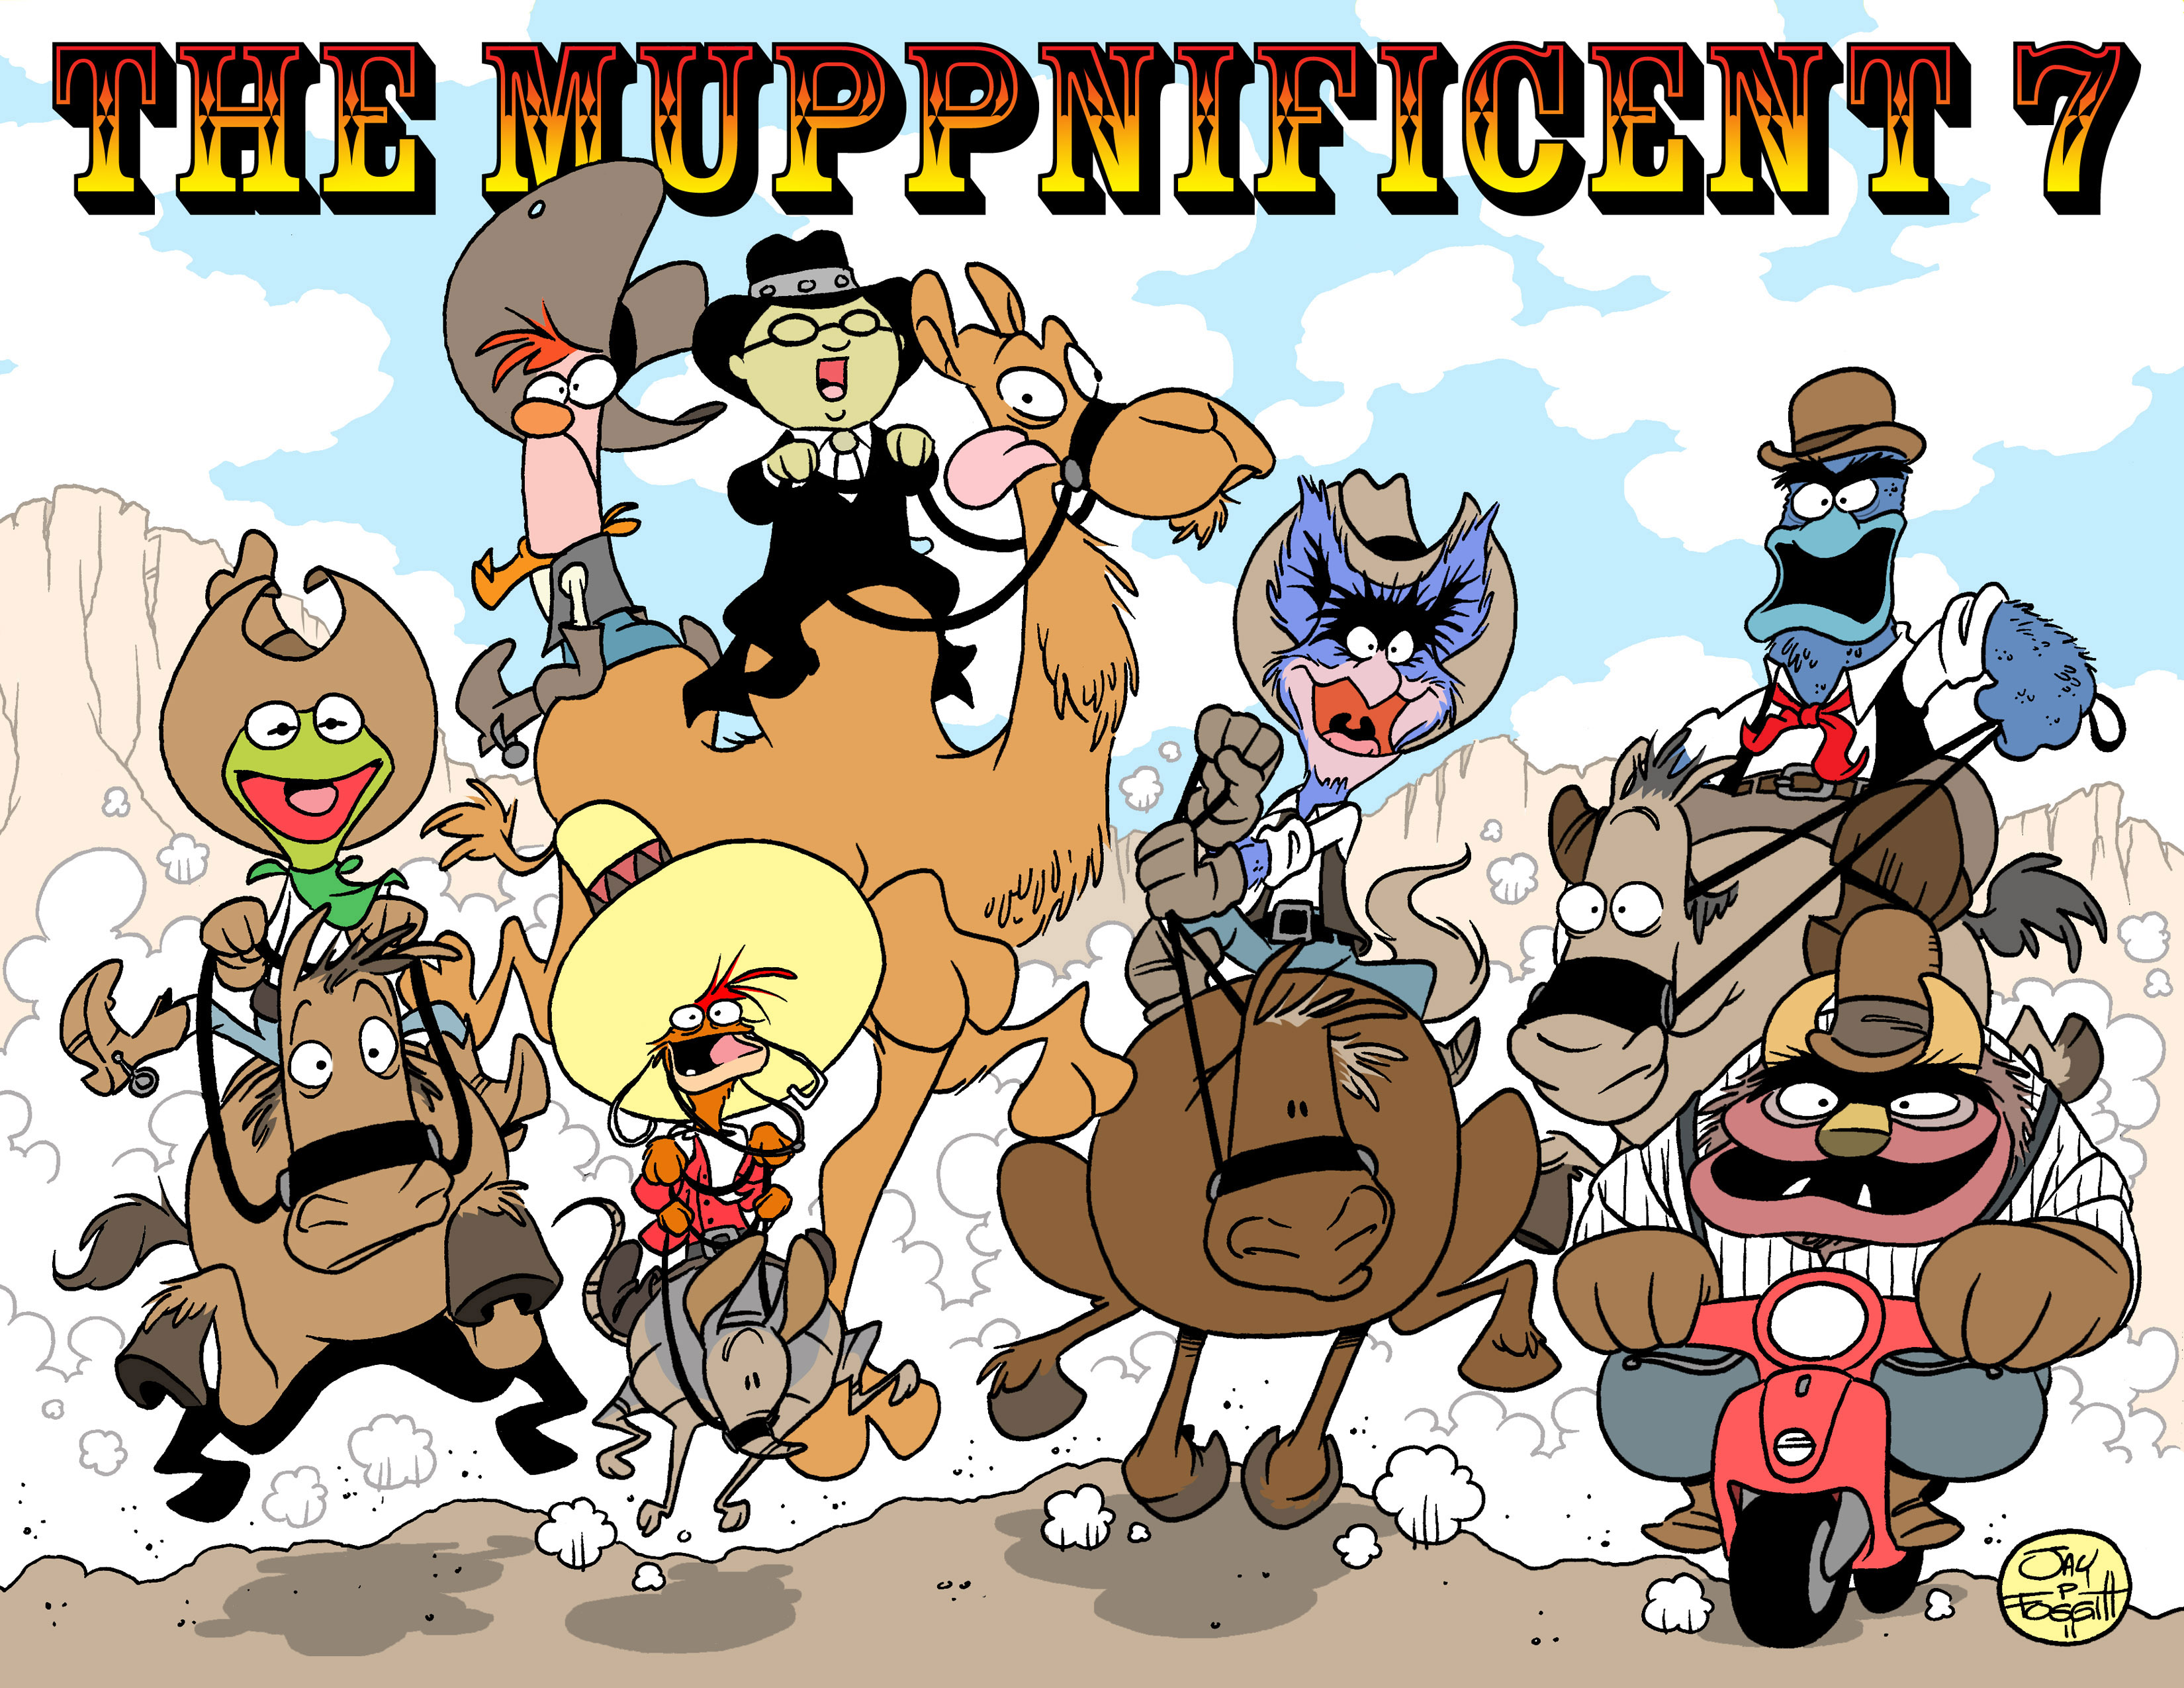 20-the_muppnificent_7_by_fourpanelhero-d3ghj3i